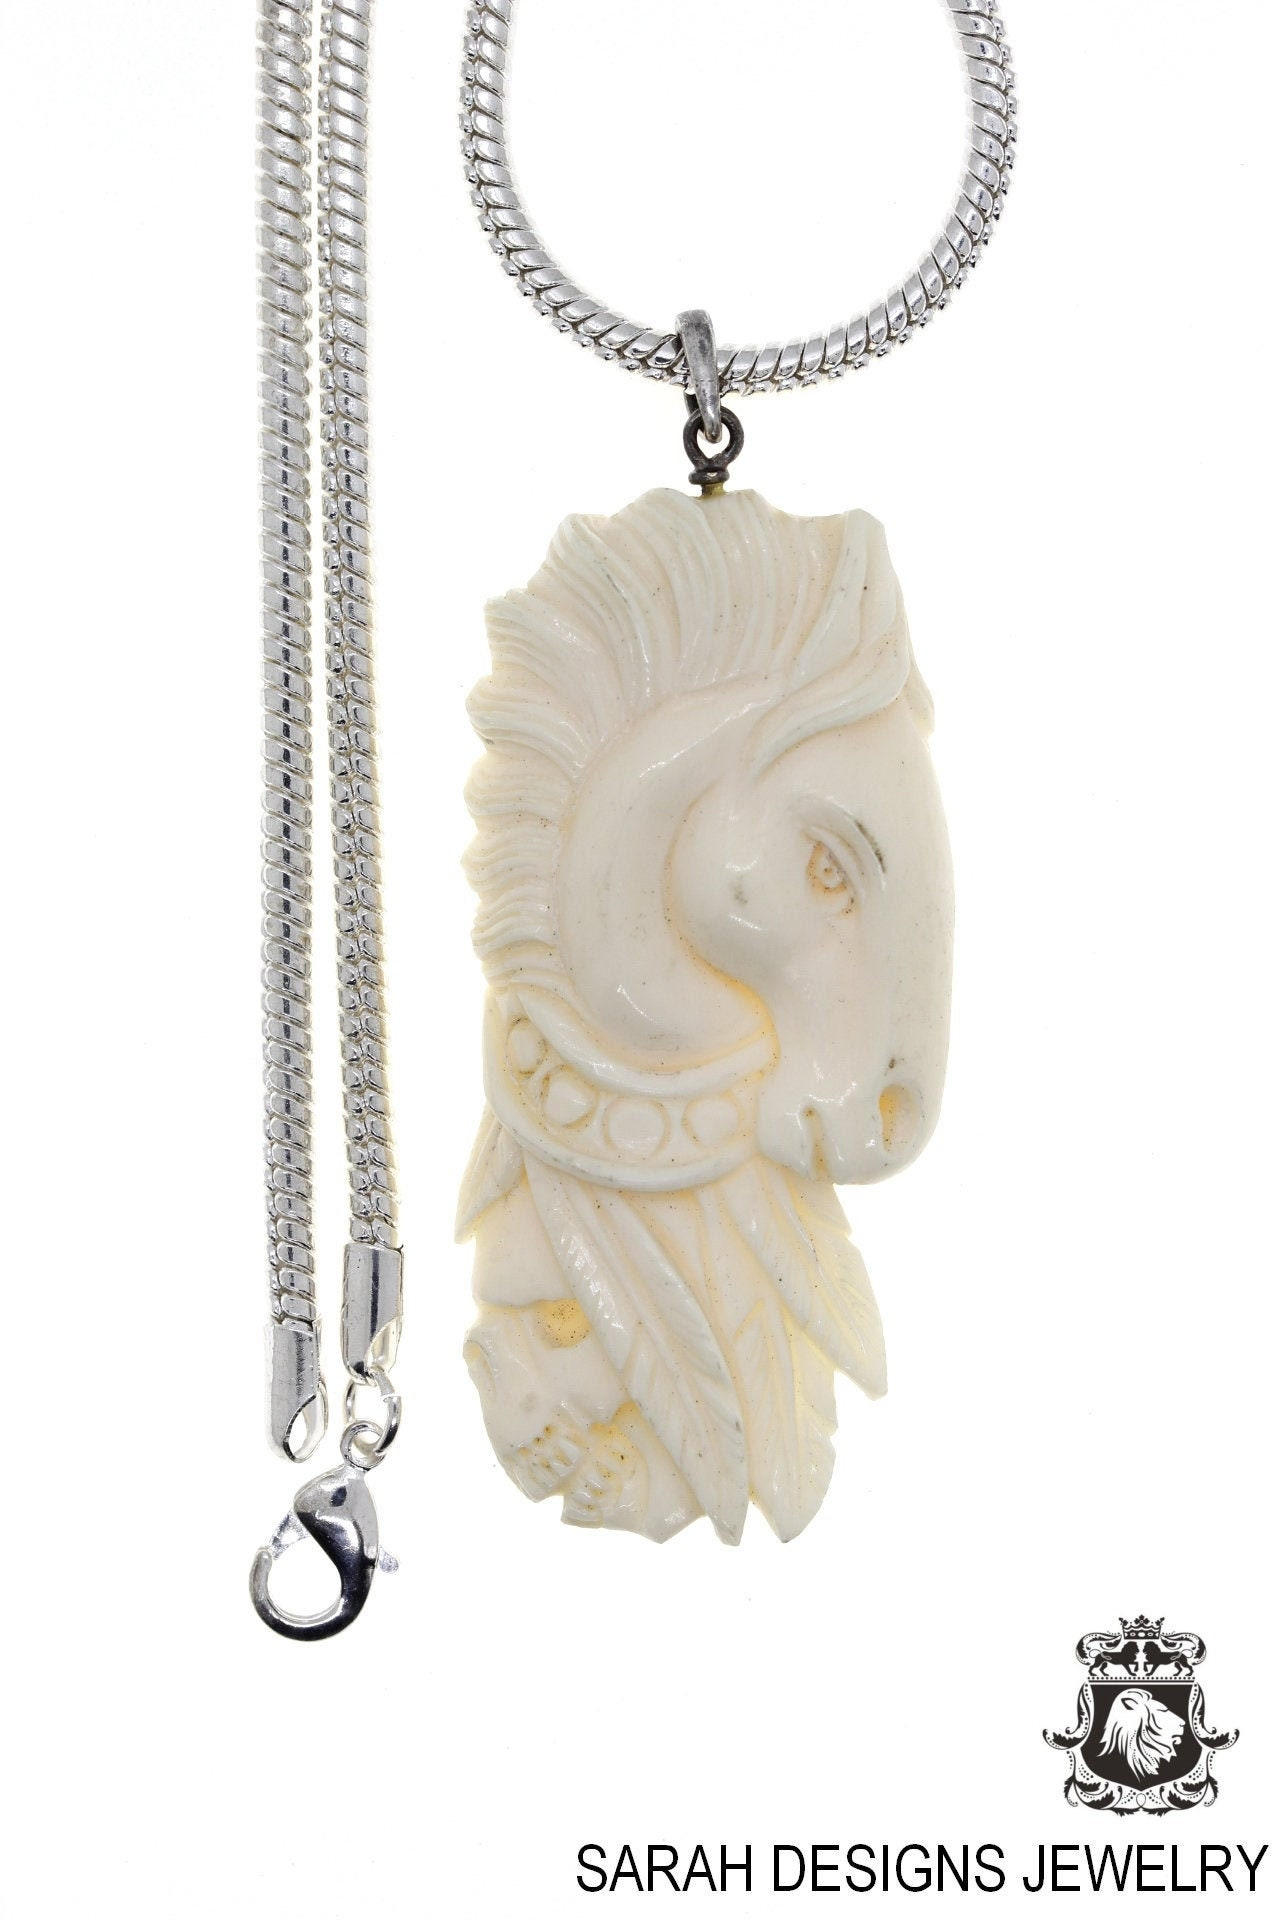 Conch Shell Lady Tibetan Repousse Silver Pendant 4MM Italian Snake Chain N470